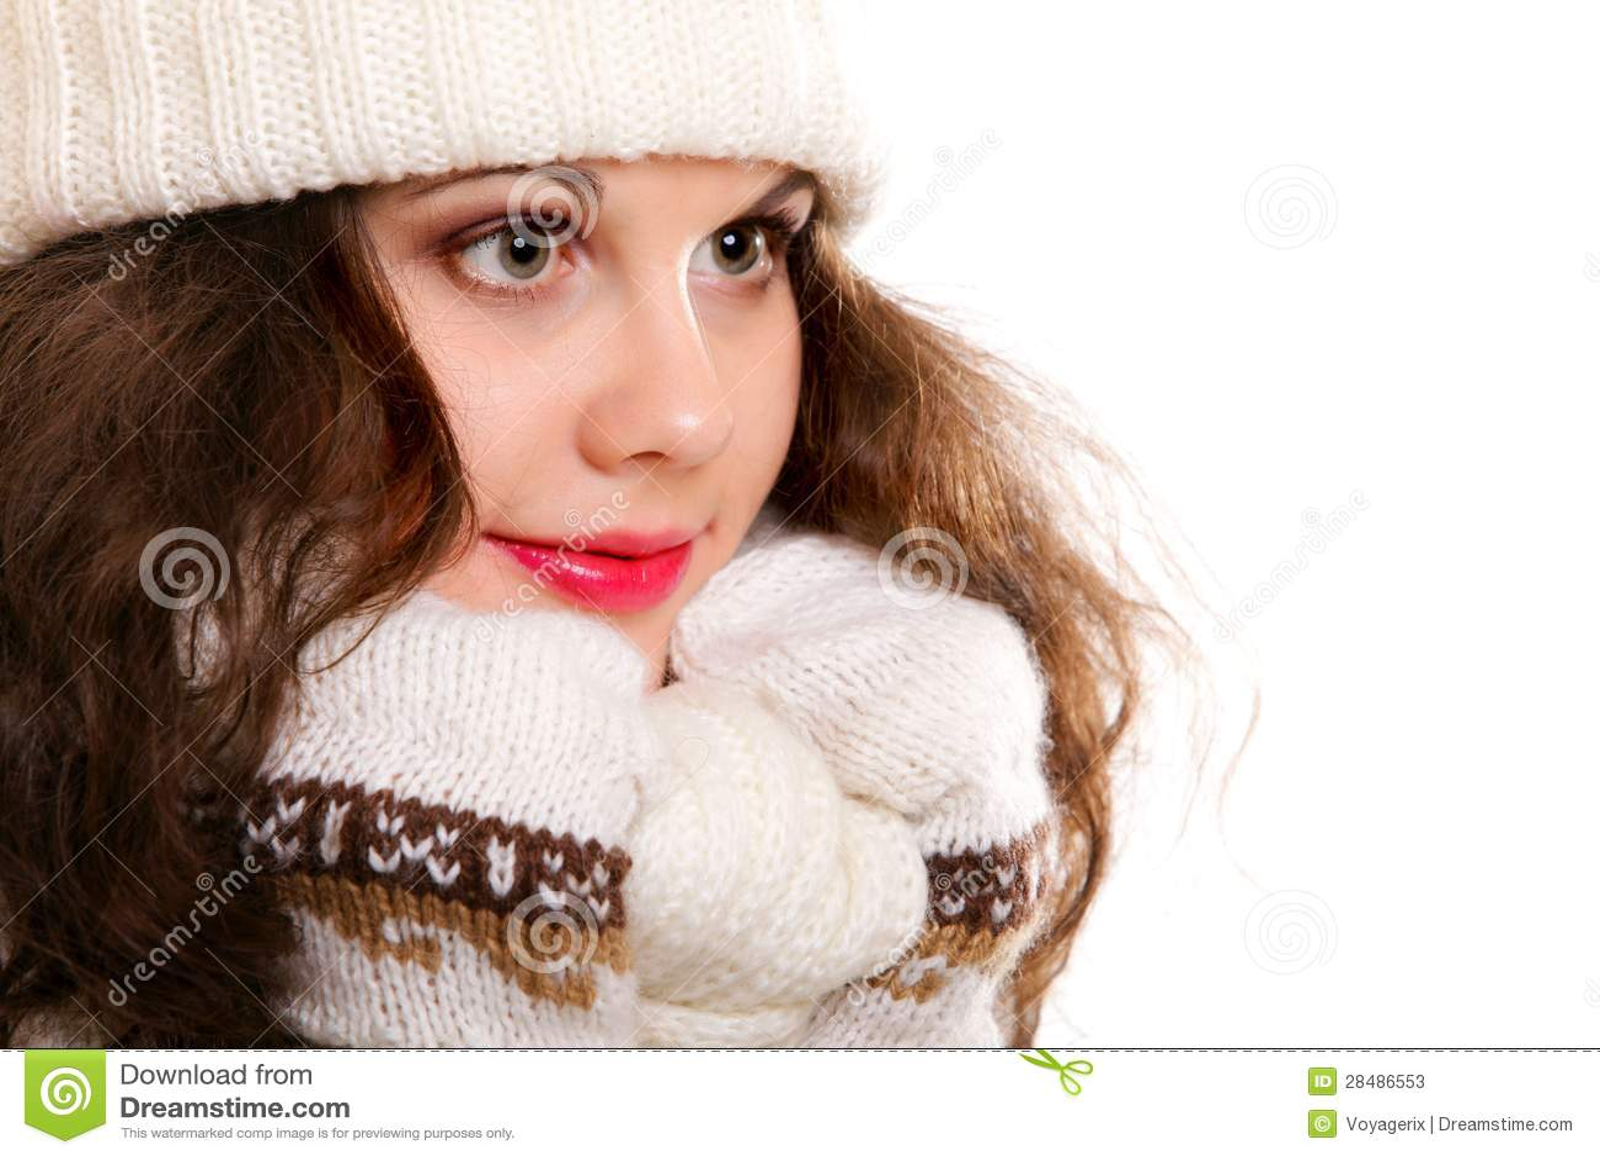 Stock Photos: Beautiful woman in warm clothing winter